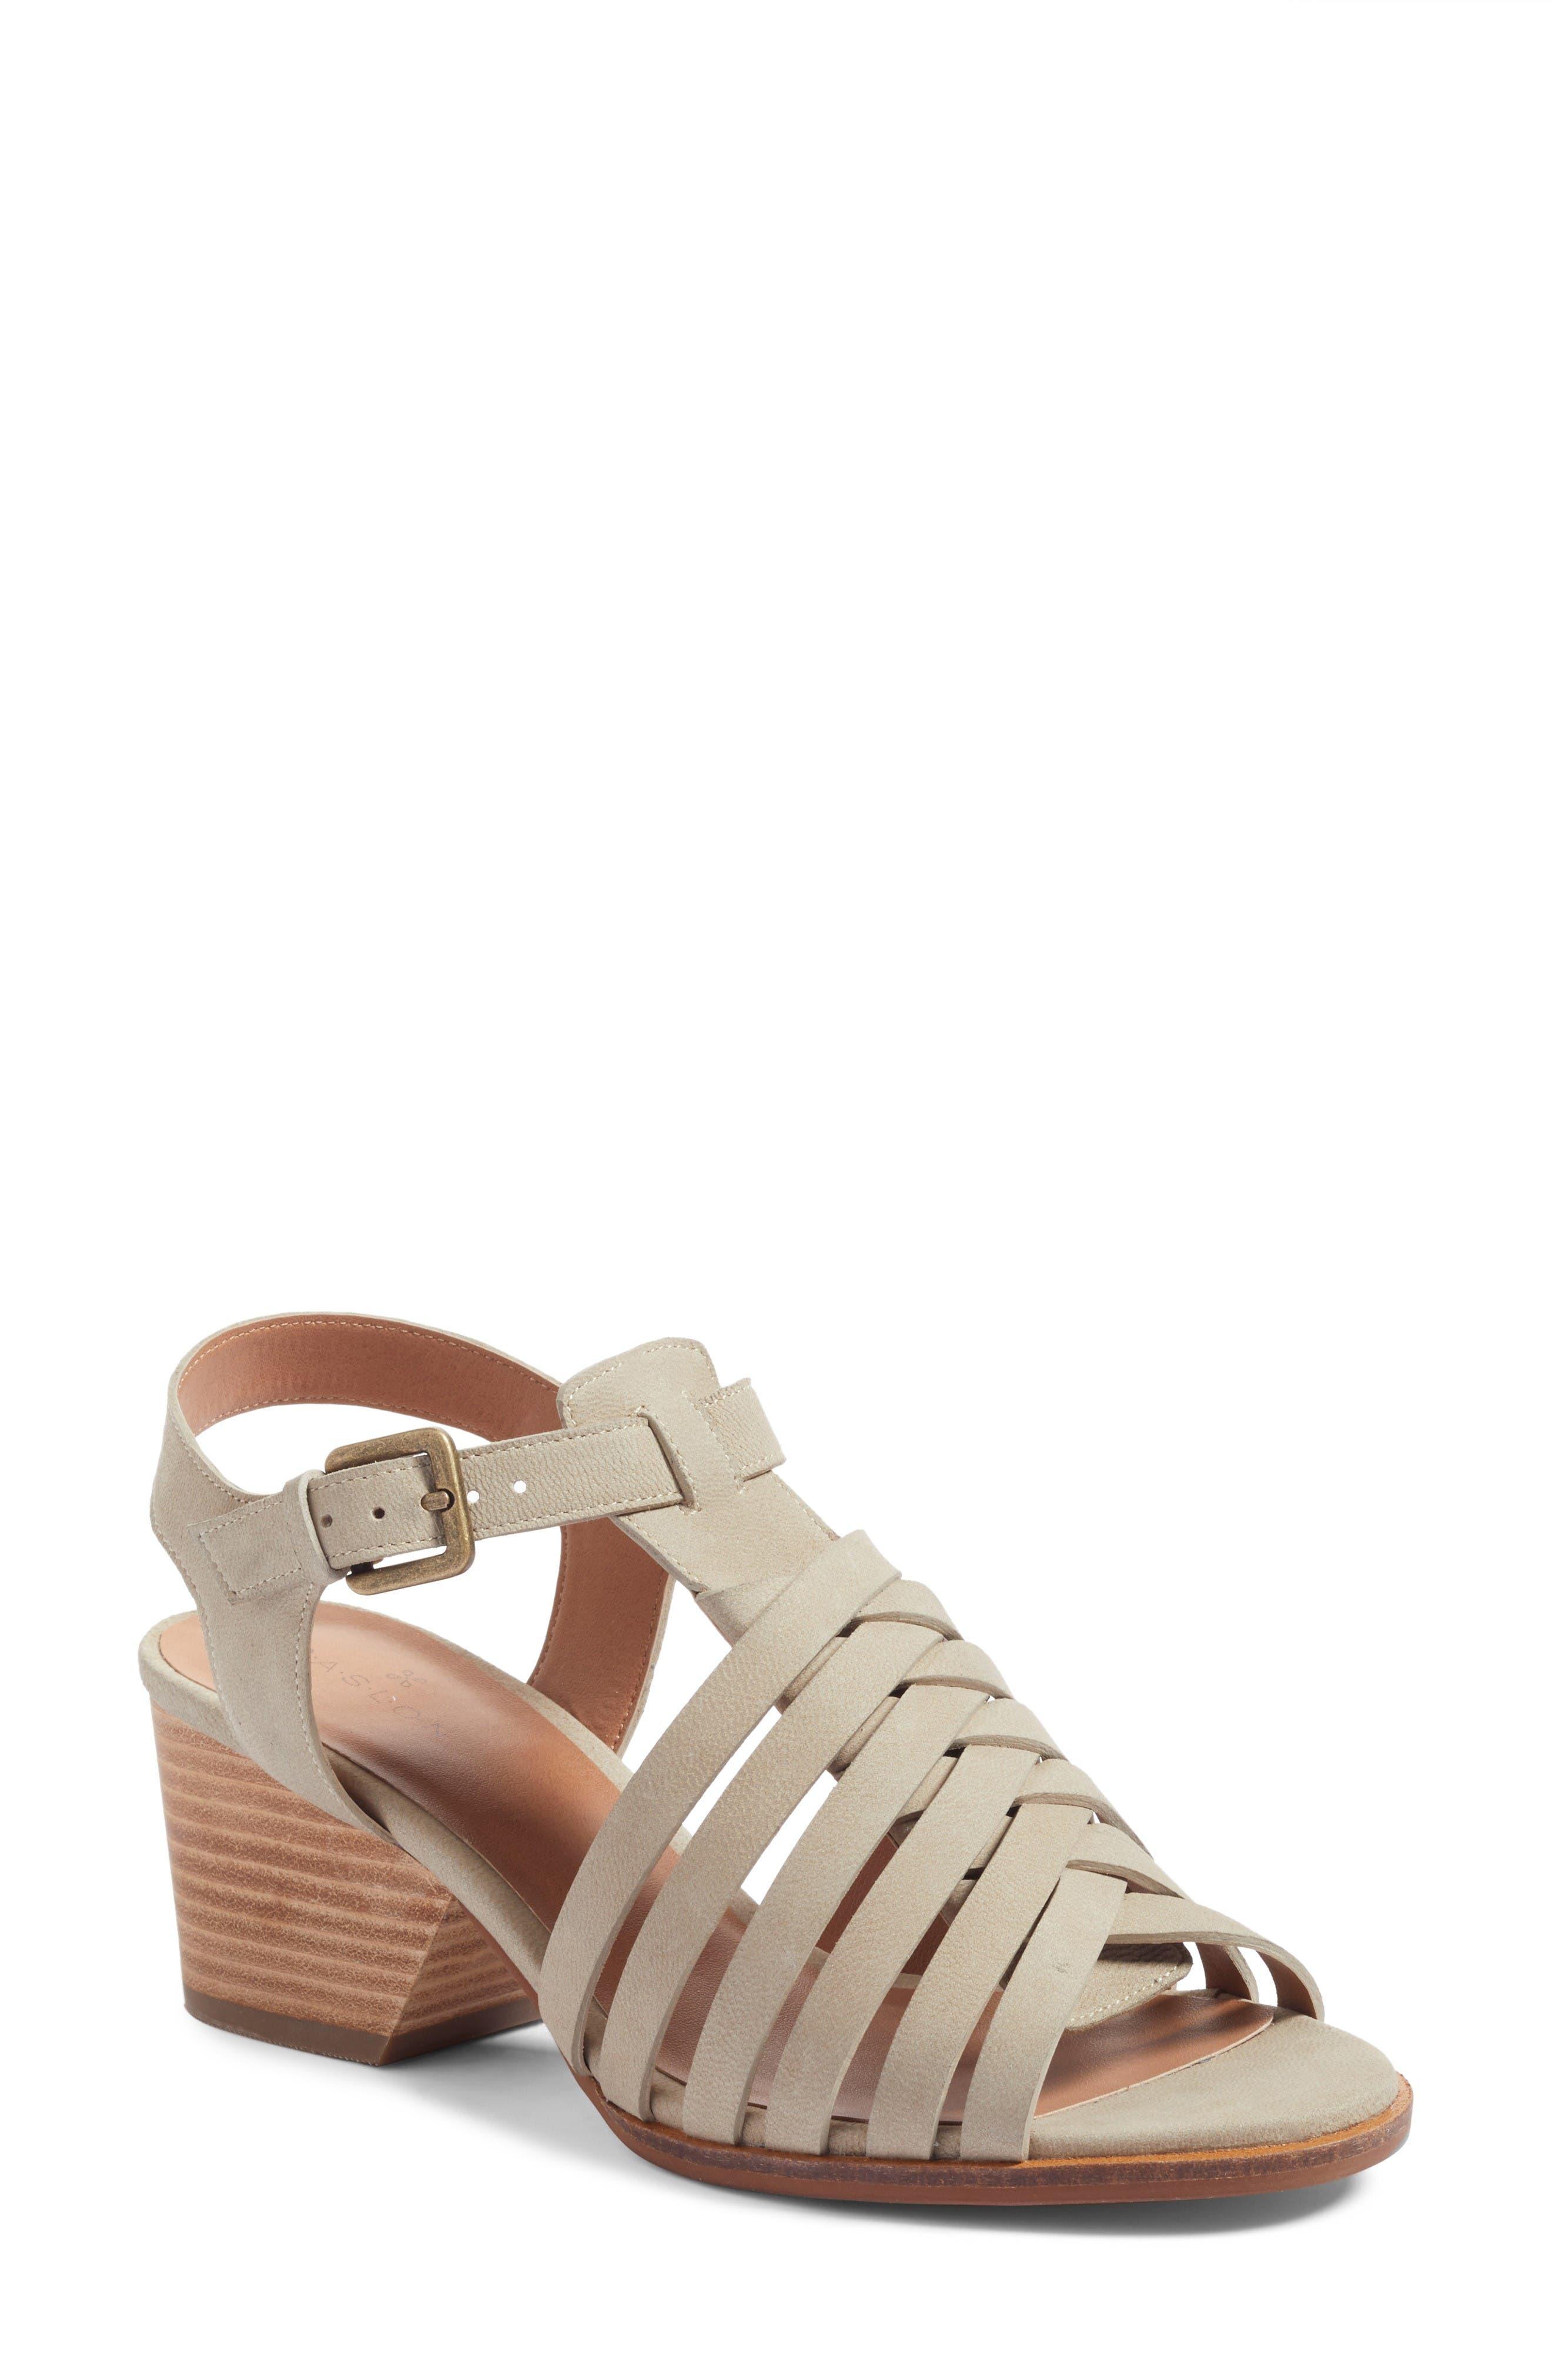 Main Image - Caslon® Camryn Sandal (Women)